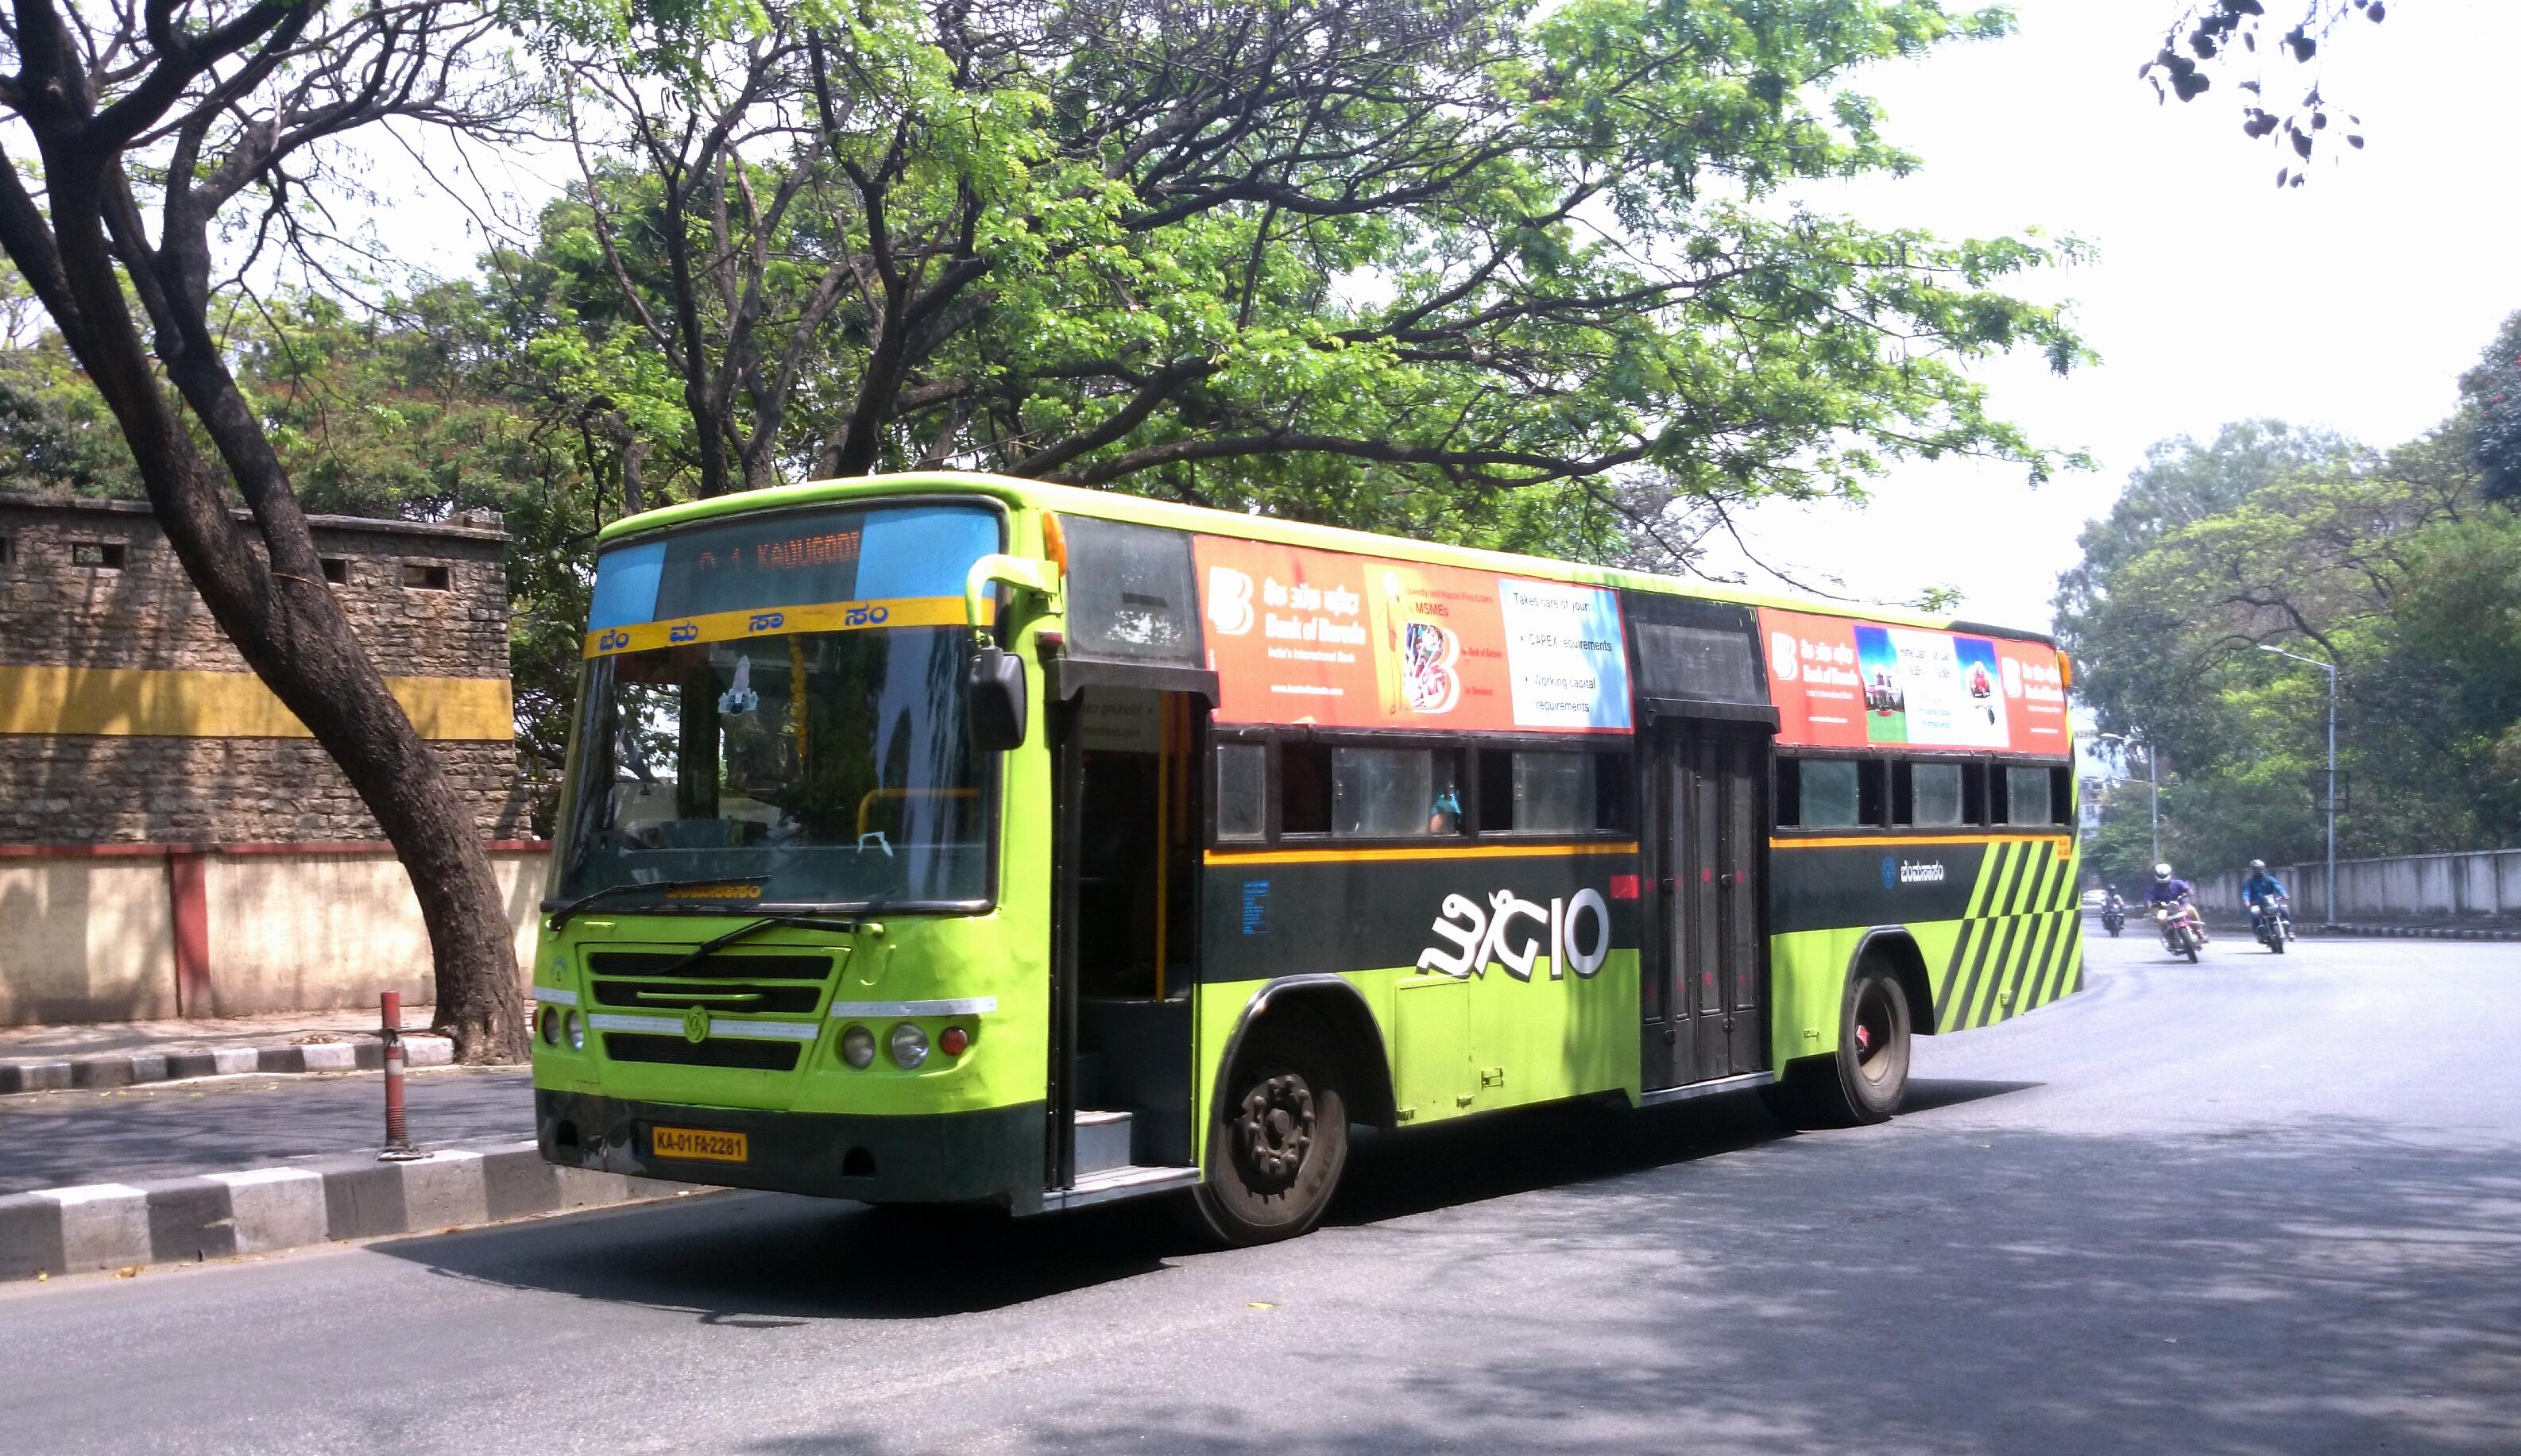 Image credit: https://upload.wikimedia.org/wikipedia/commons/9/94/Bangalore_BMTC_BIG_10_Bus.jpg